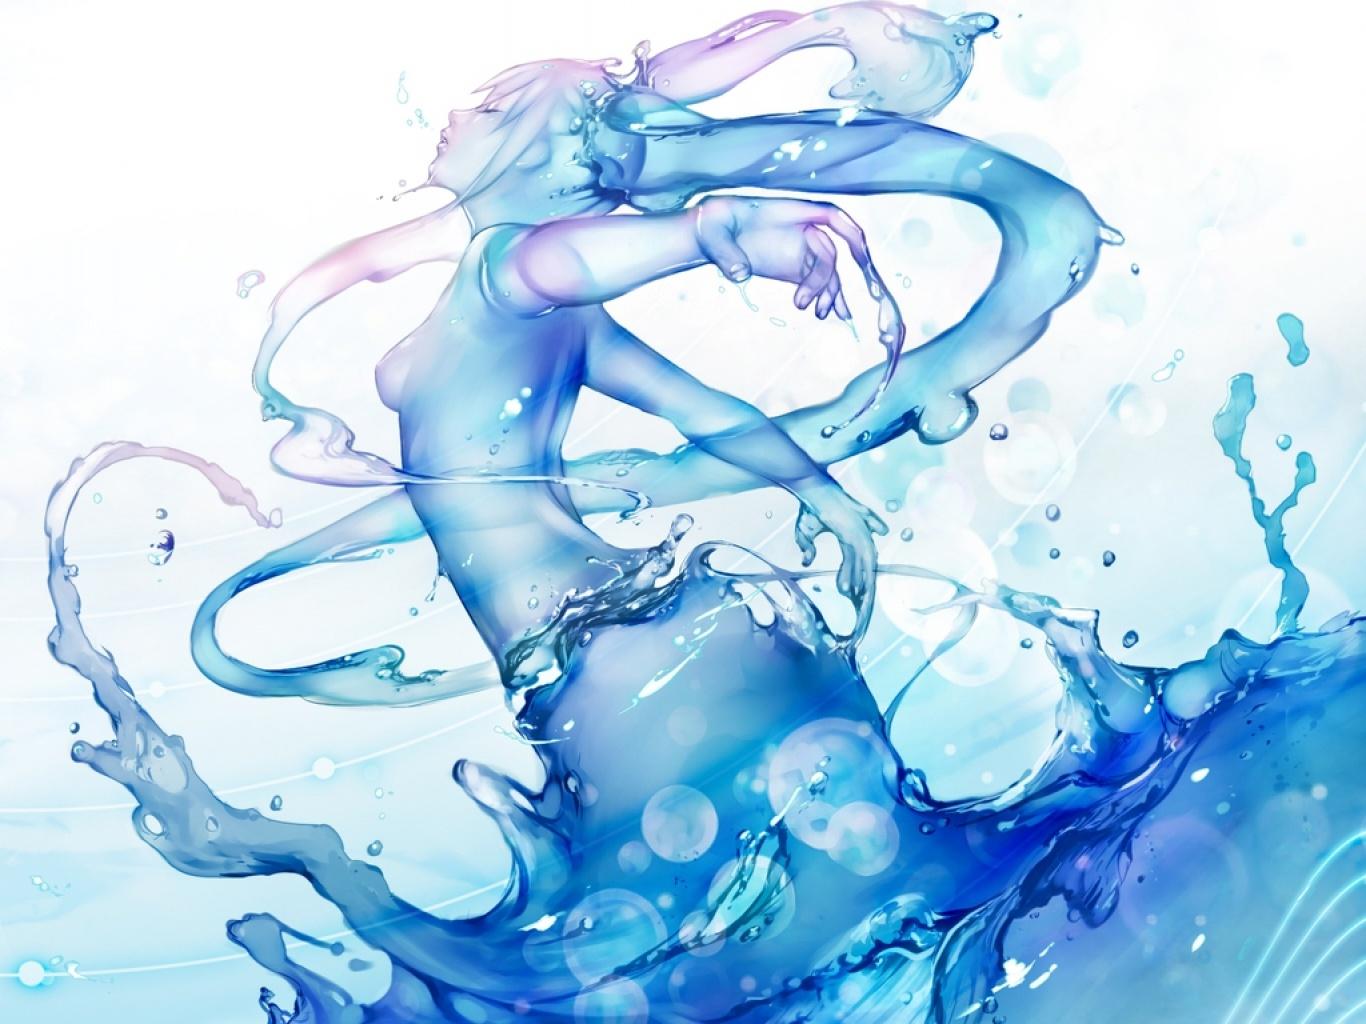 Cars Disney Hd Fondo D Mujer De Agua 348120 Wallpaper wallpaper